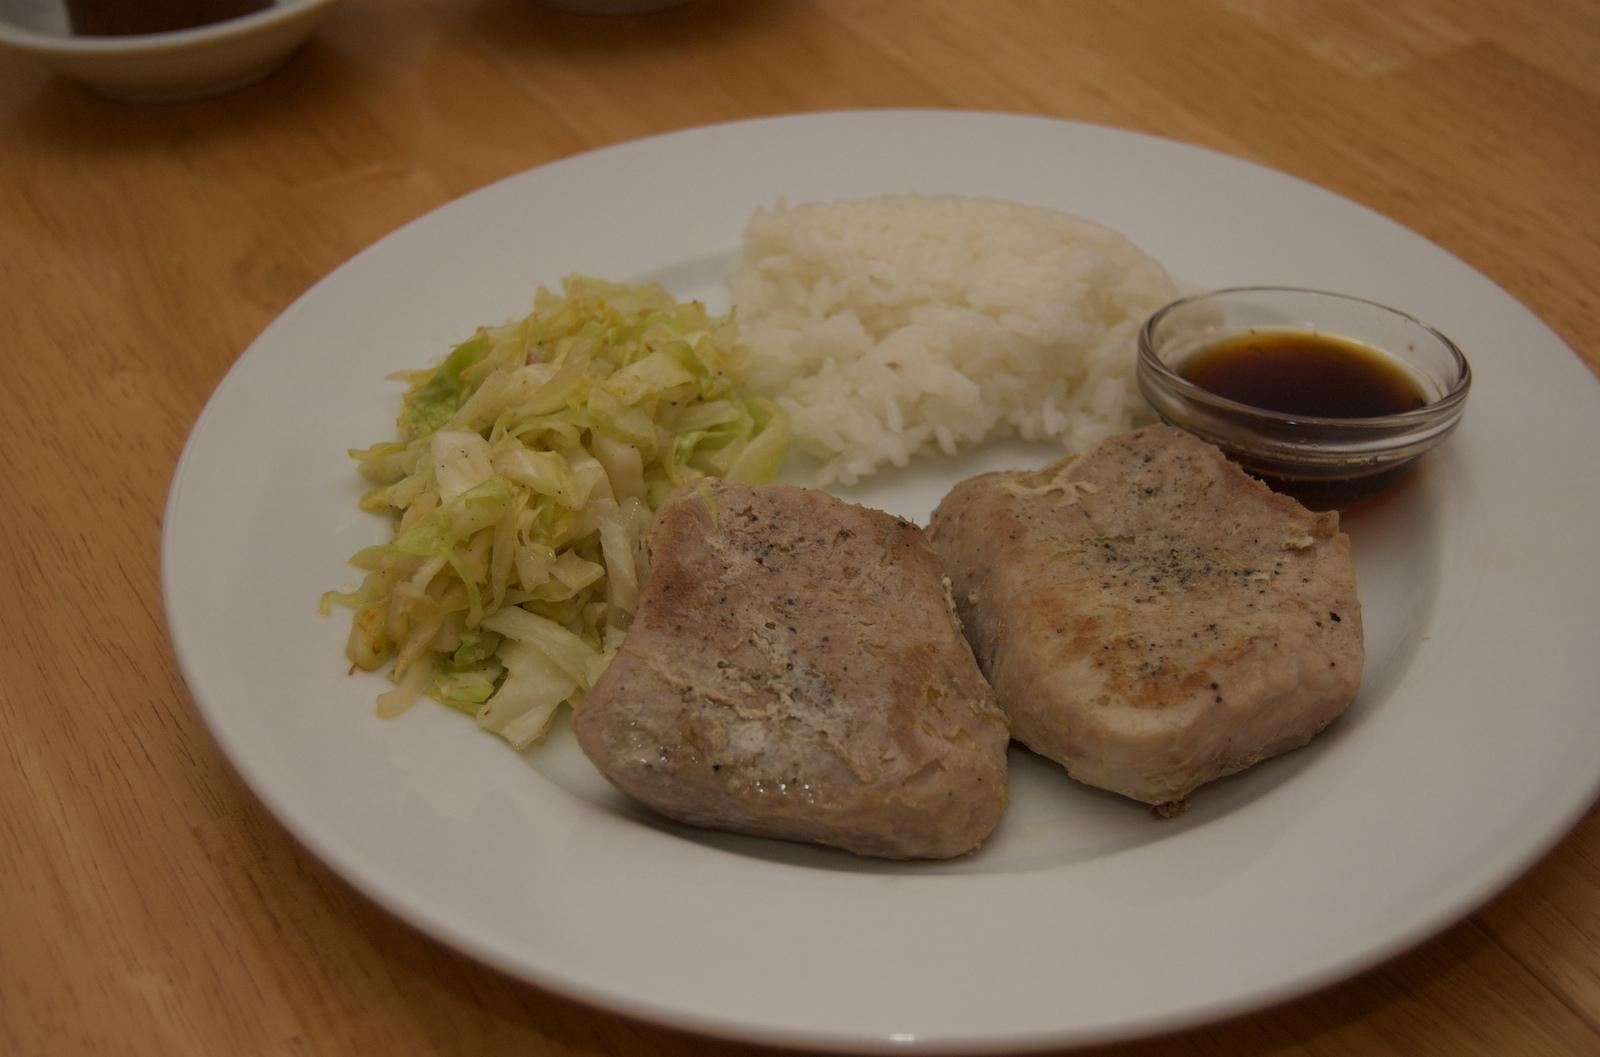 http://blog.rickk.com/food/2010/03/25/porkchop1.jpg